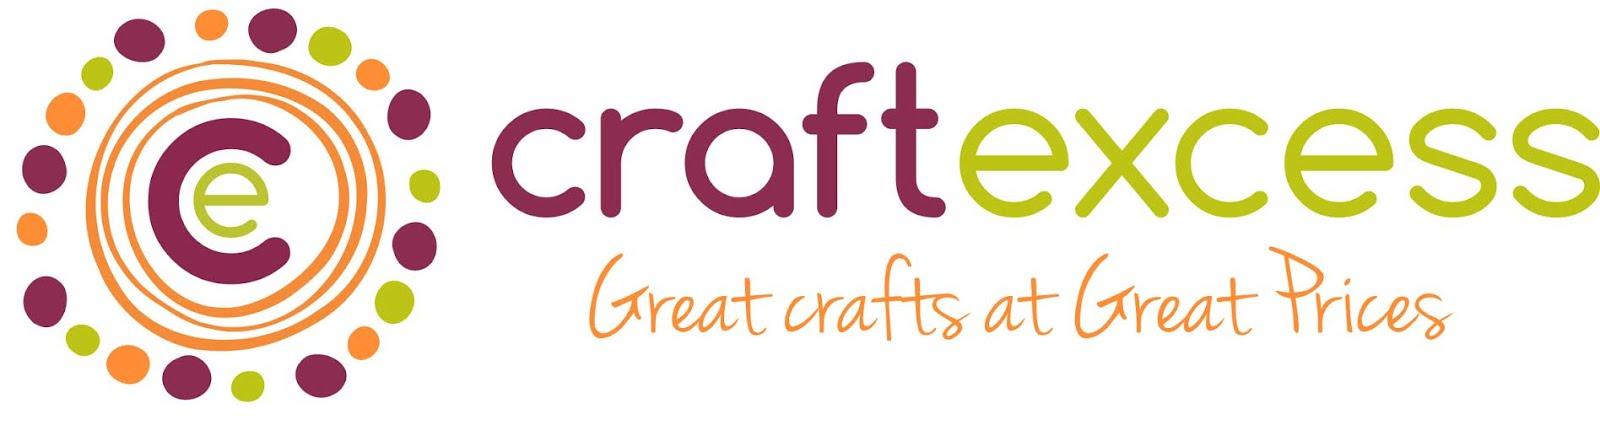 Craftexcess Website